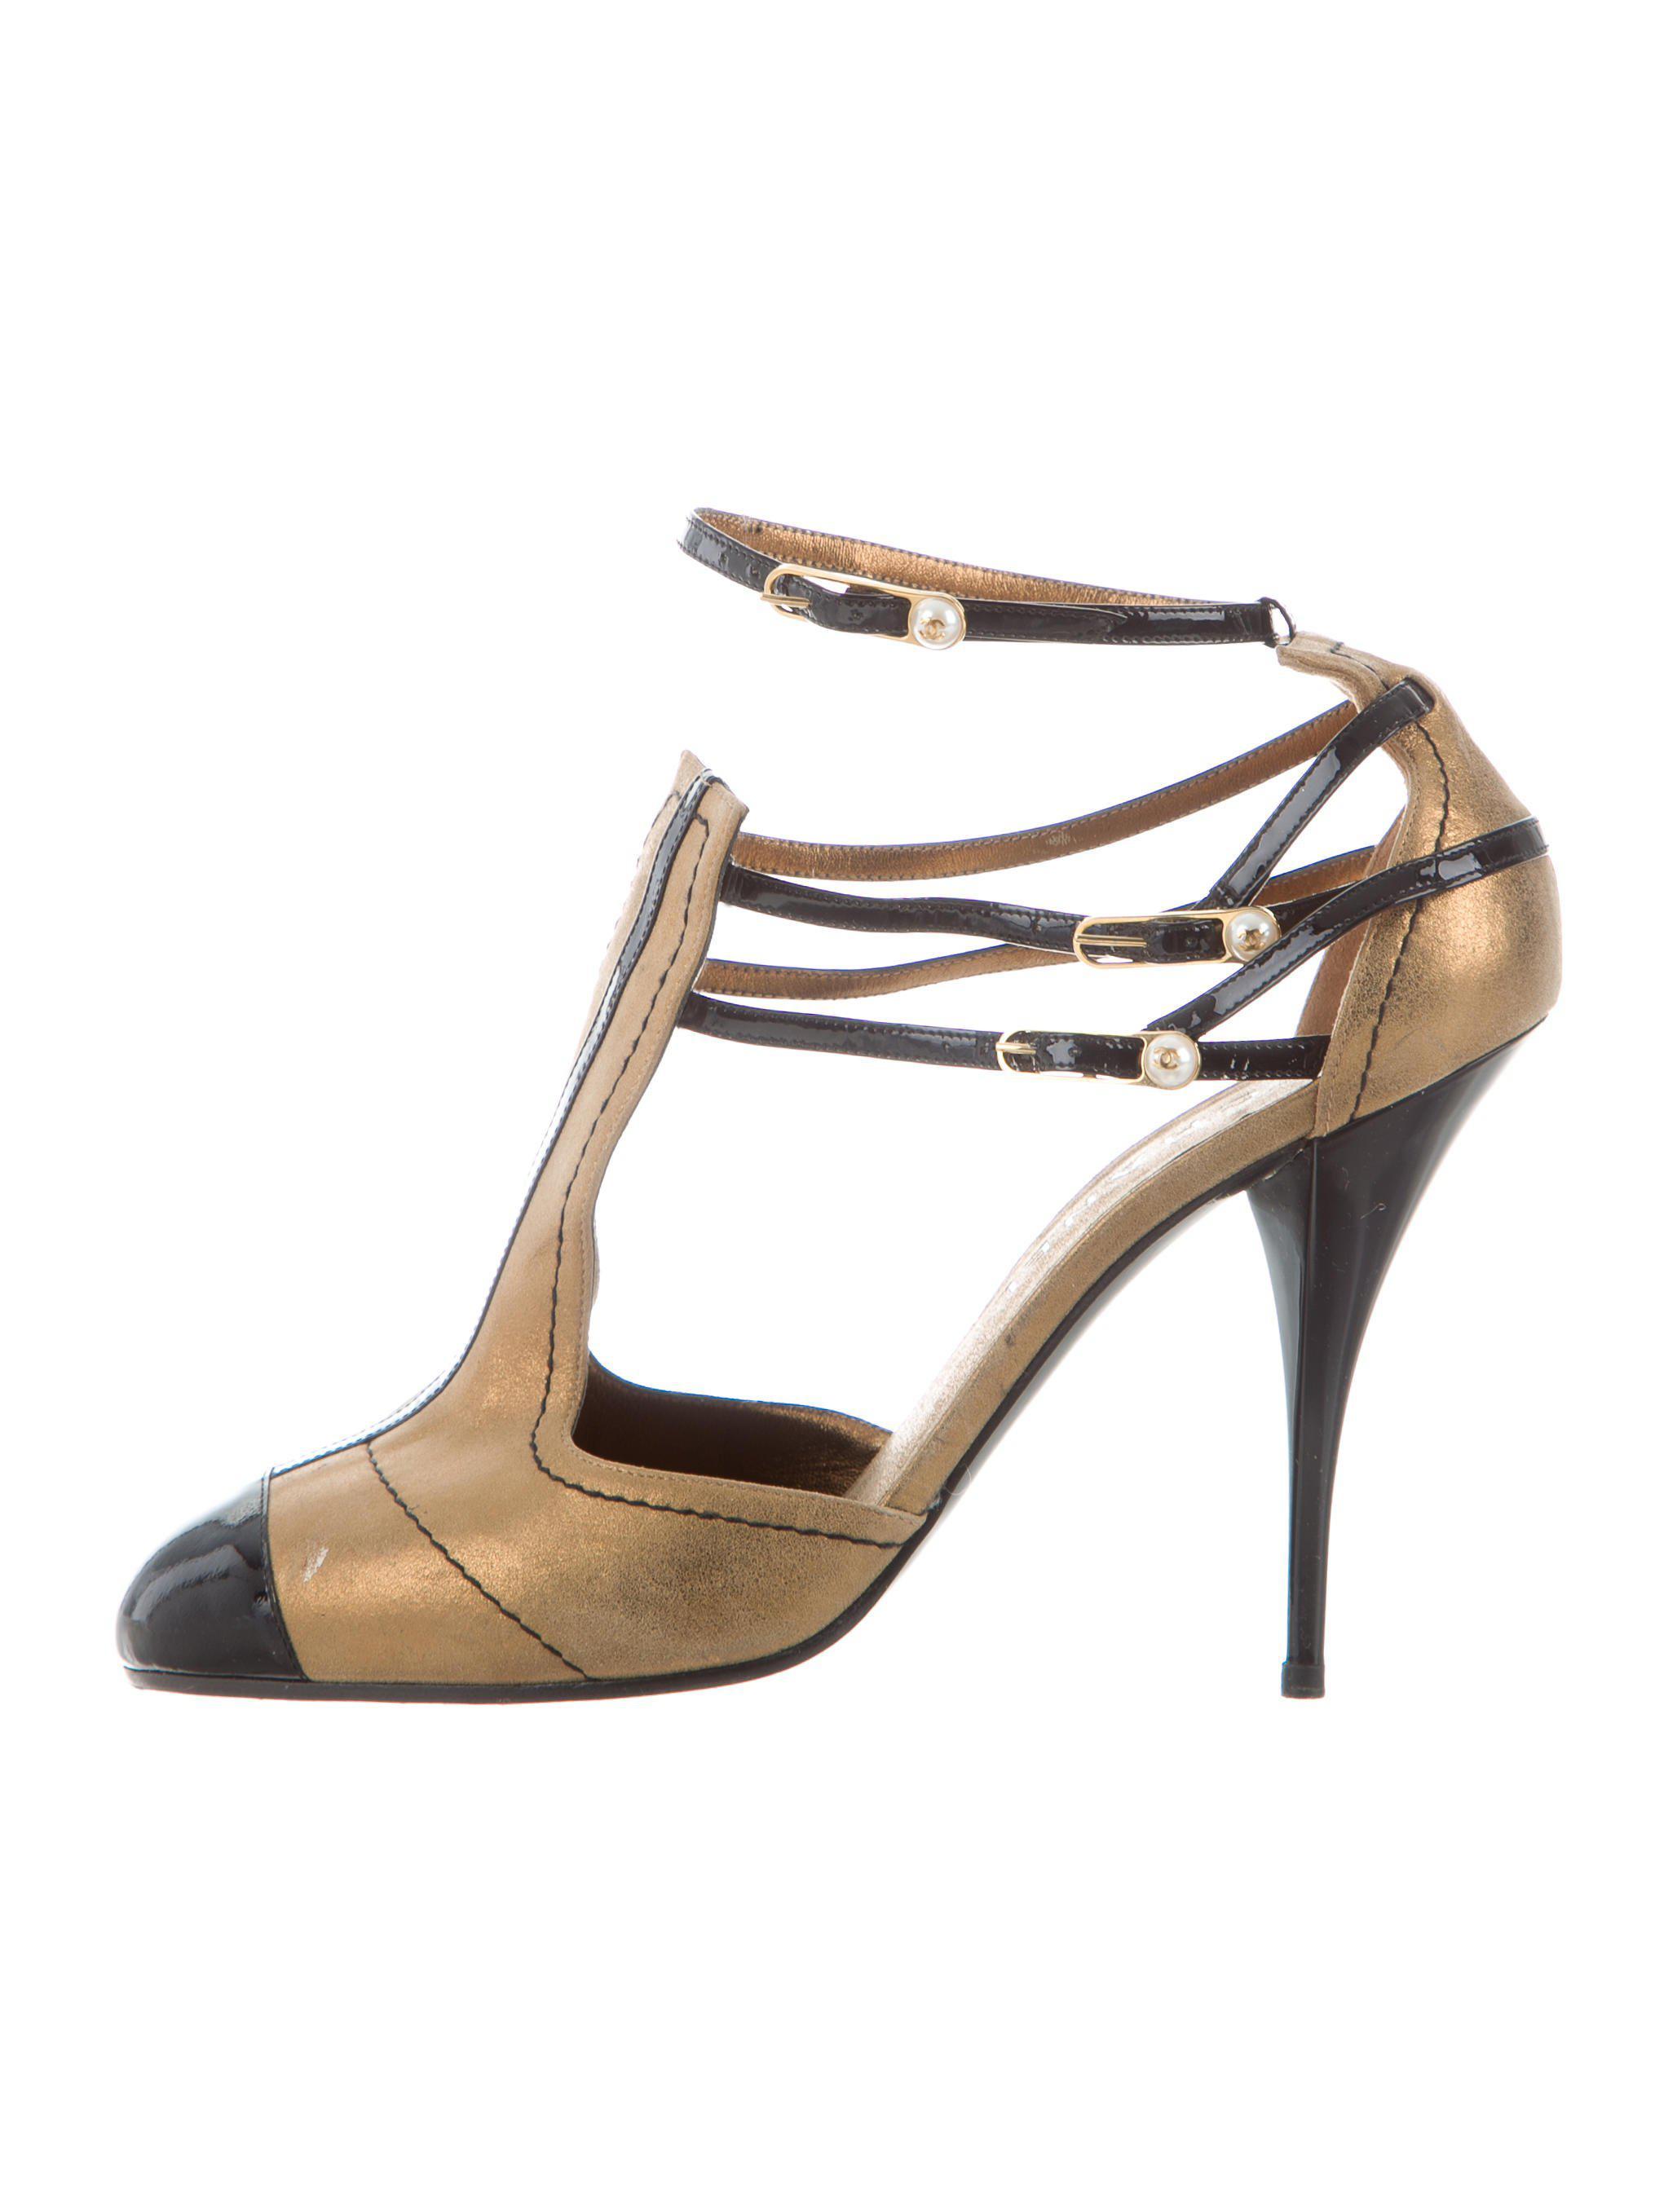 1fc841abf8f ... Lyst - Chanel Cap-toe Pumps Gold in Metallic super cute d93a1 44dcc ...